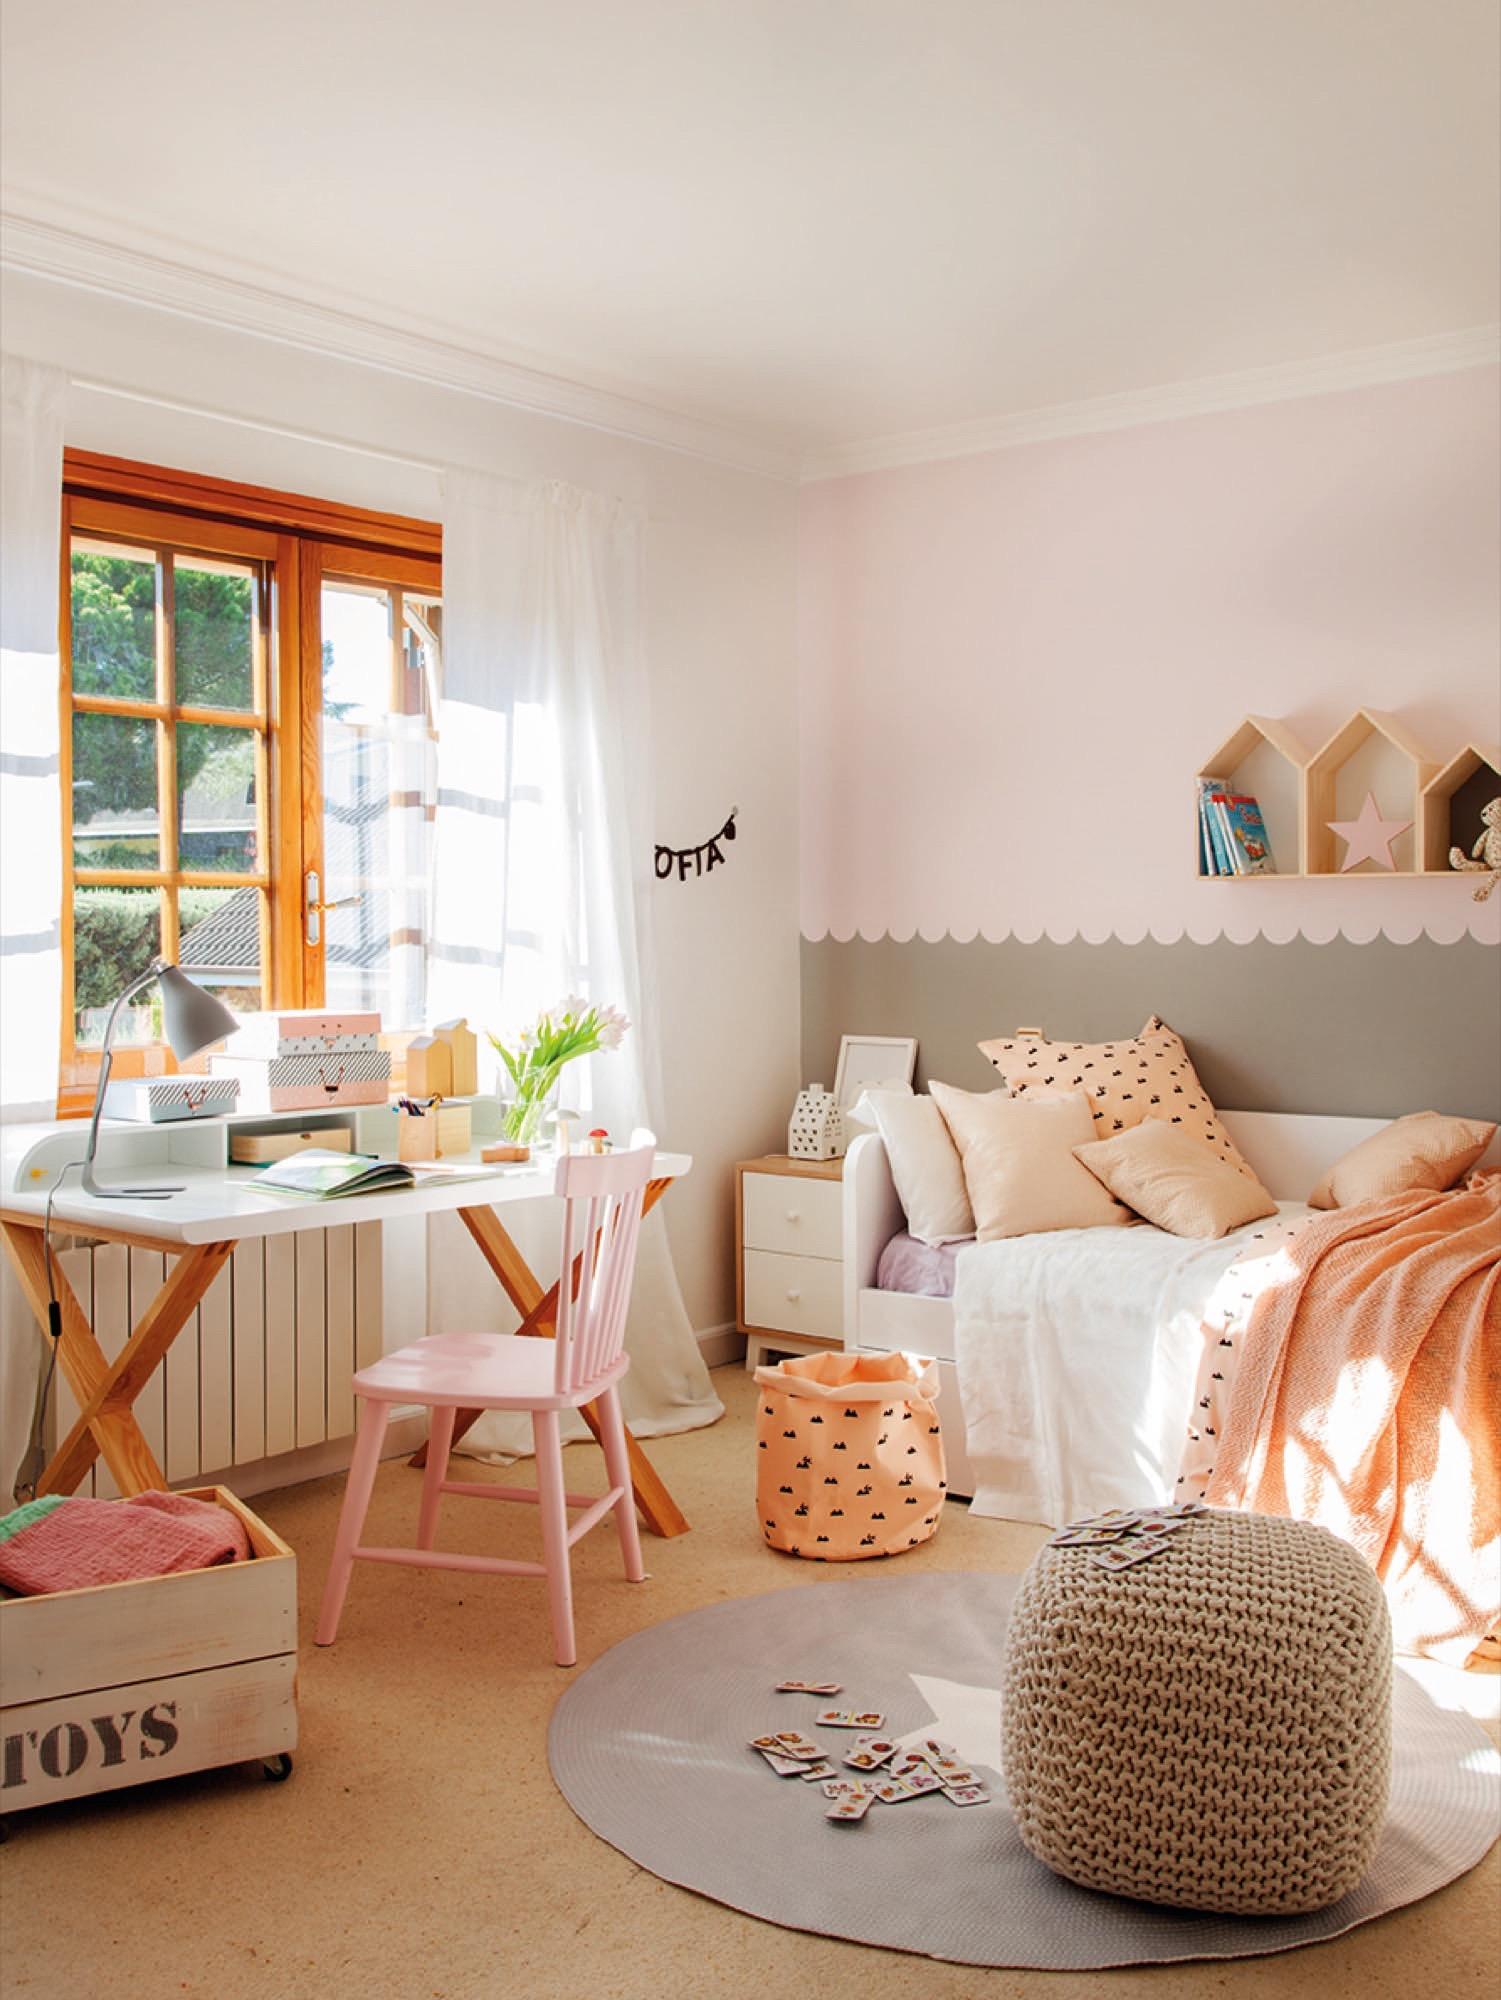 124 fotos de muebles ni os for Dormitorios pintados en gris